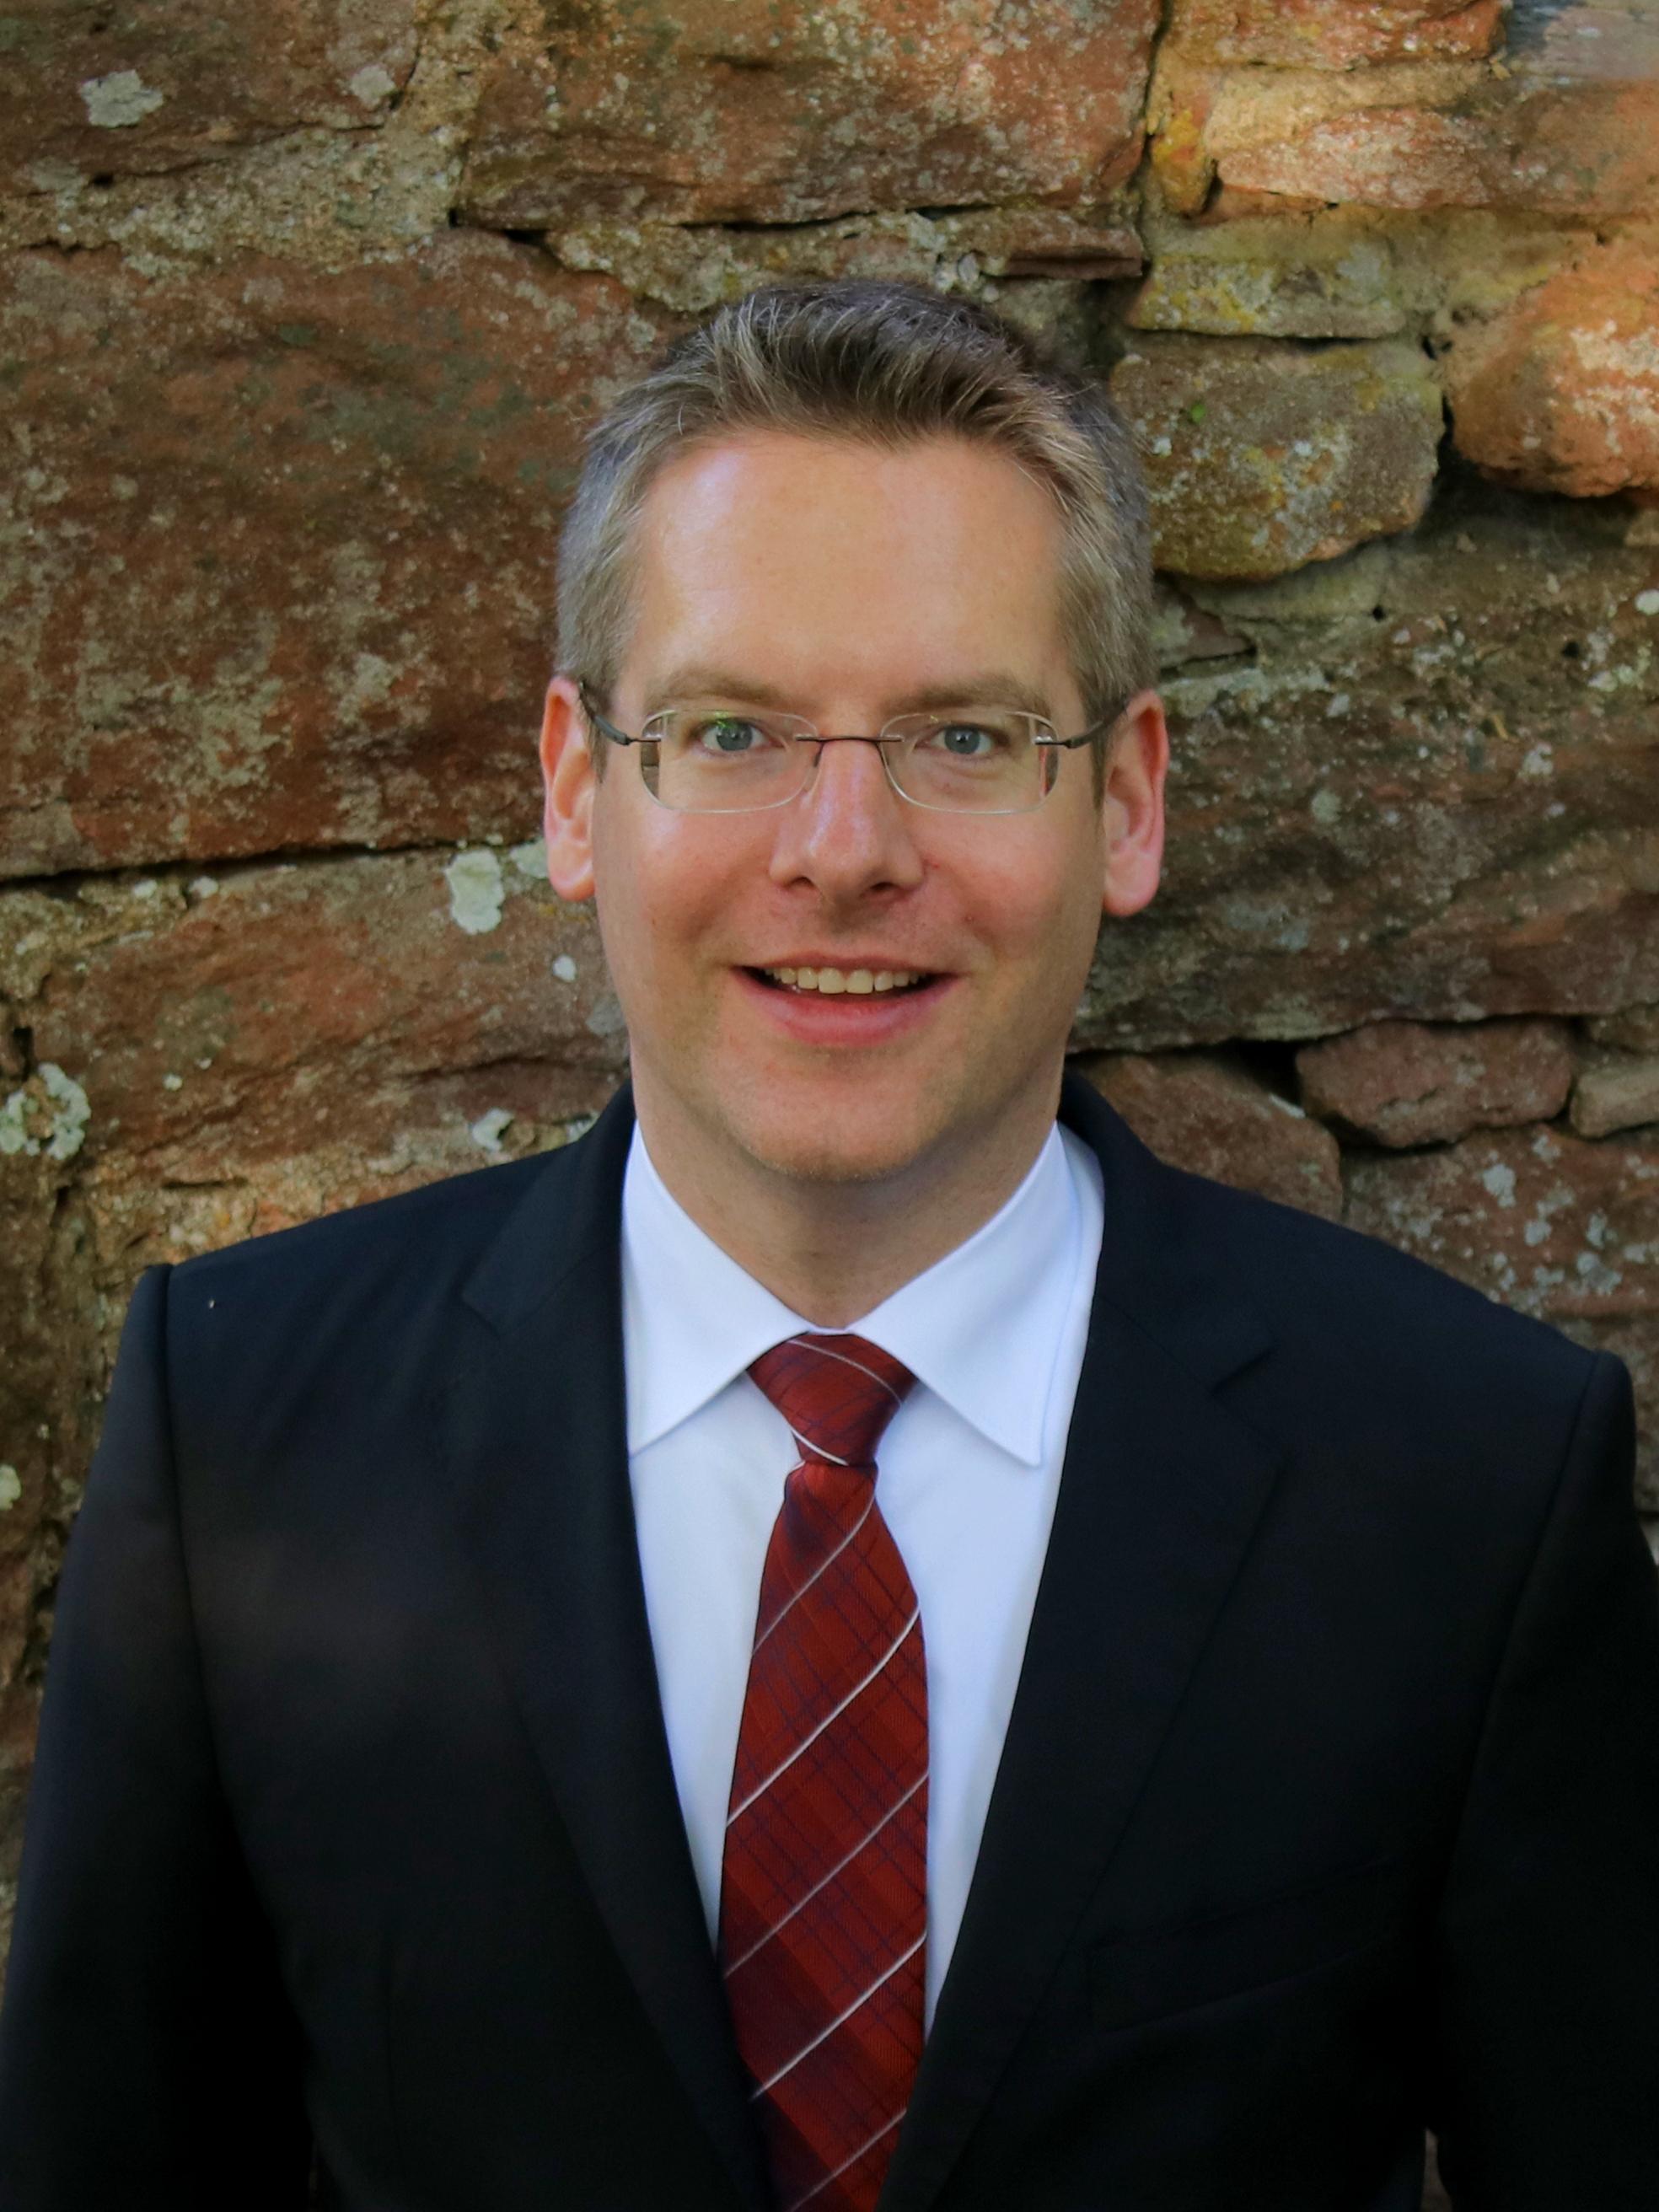 Notar Jens Haßelbeck